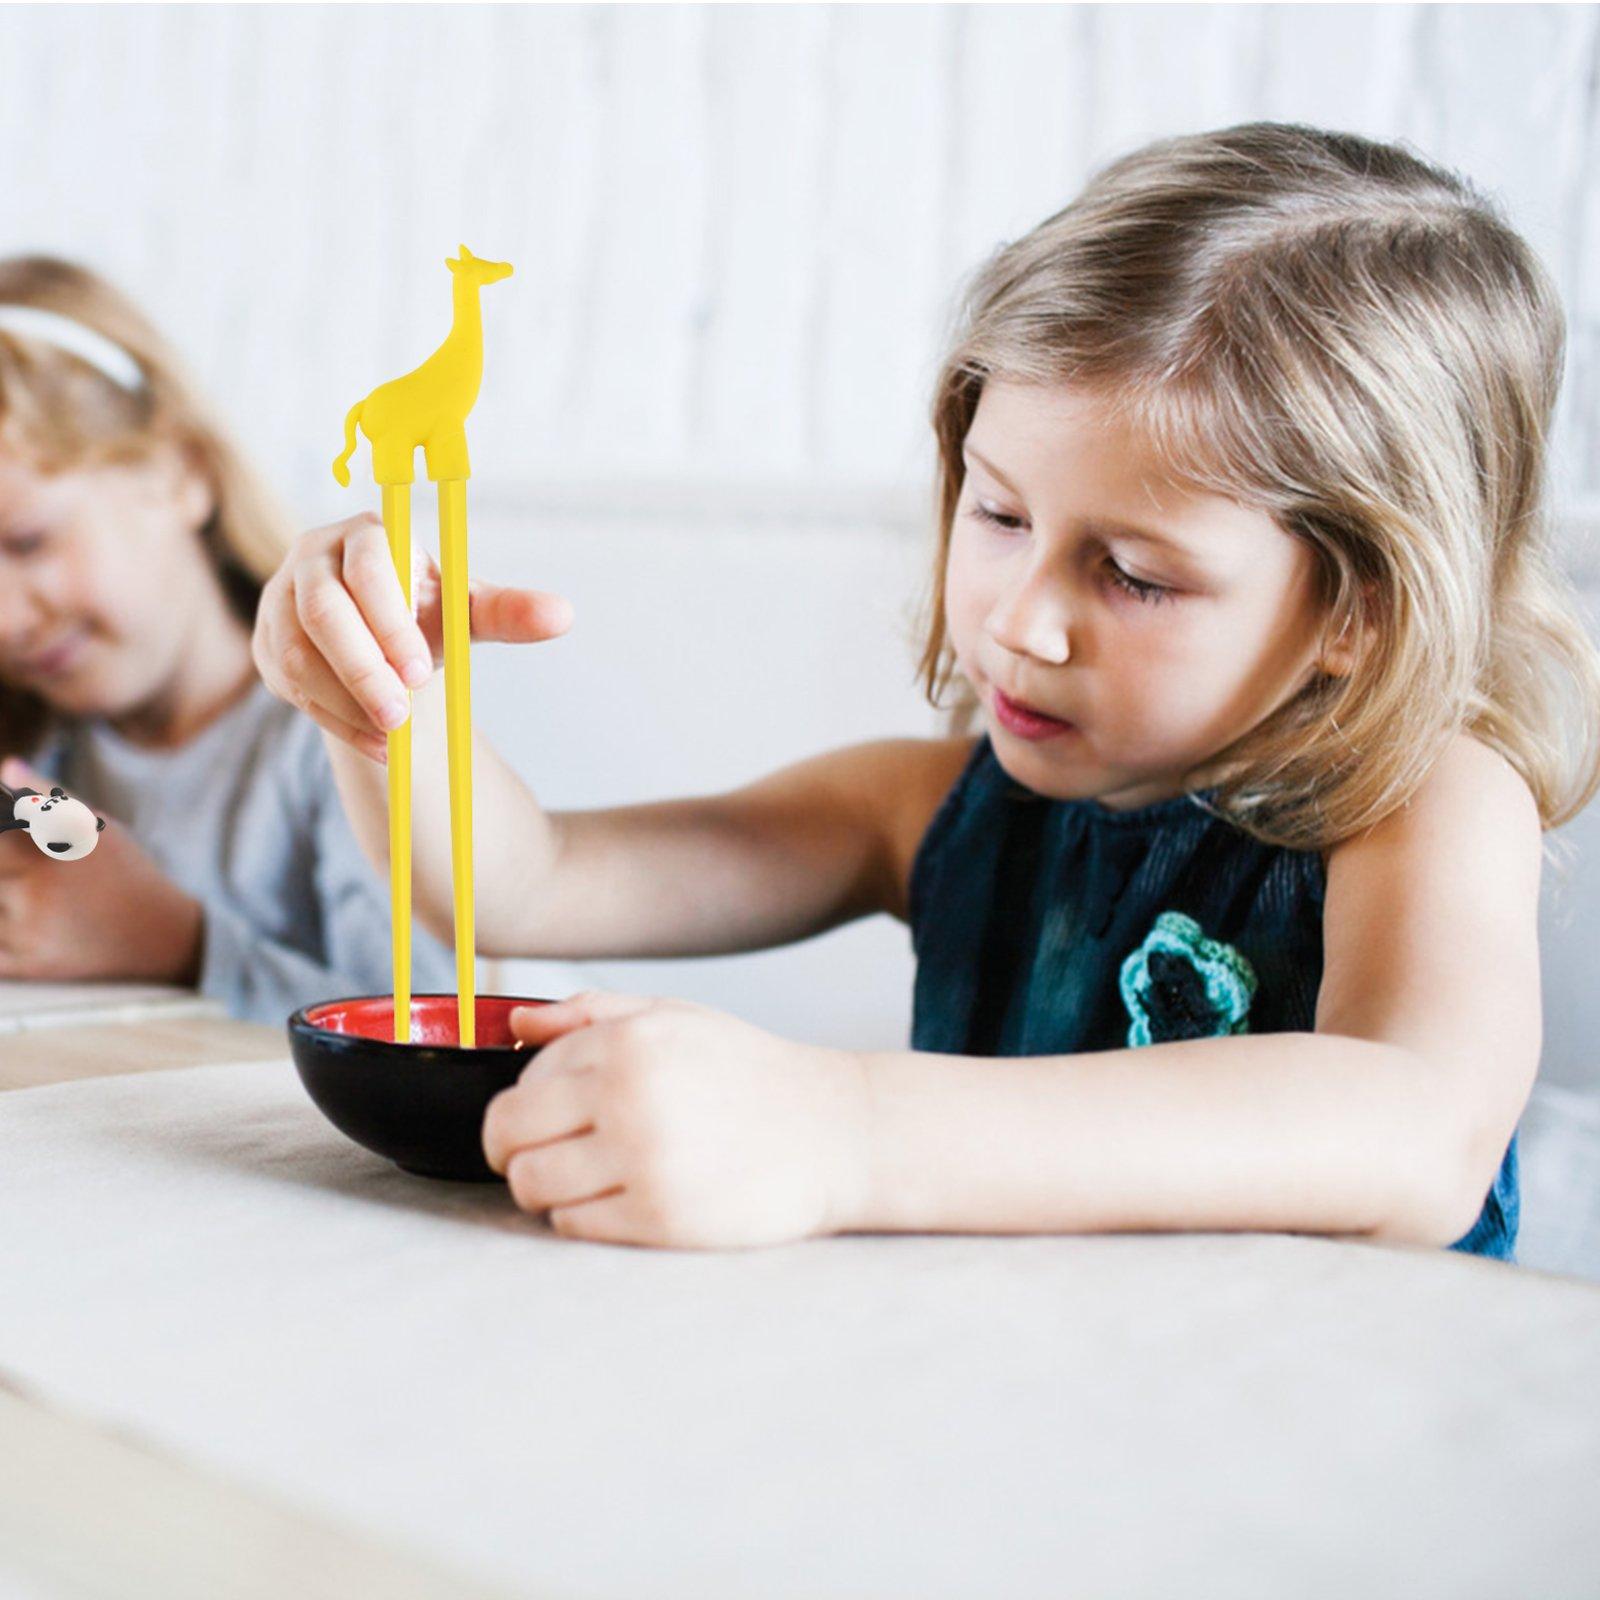 LANMOK Training Chopsticks for Children Adults,4 Pairs Children\'s Chopsticks Multi Animal Style Design Learning Chopstick Set for Kids Child Beginners Right or Left Handed Reusable Fun Helper